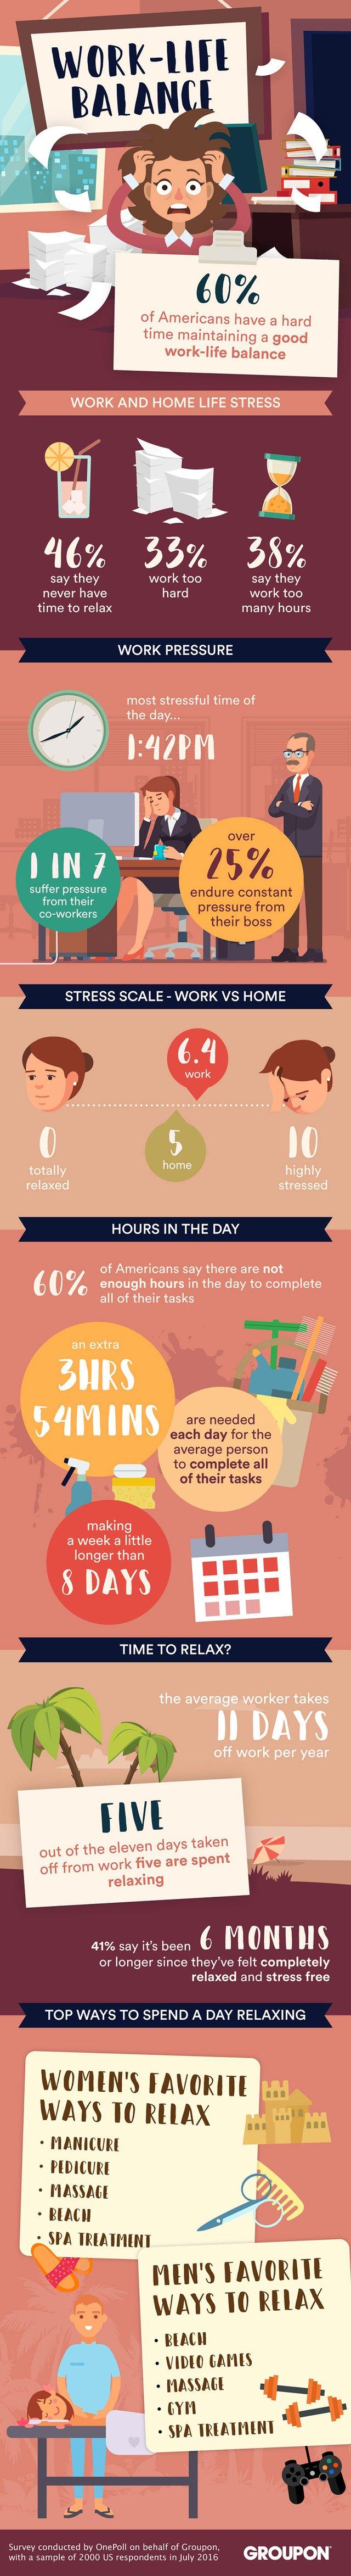 work-life-balance_full_infographic_gm.jpg